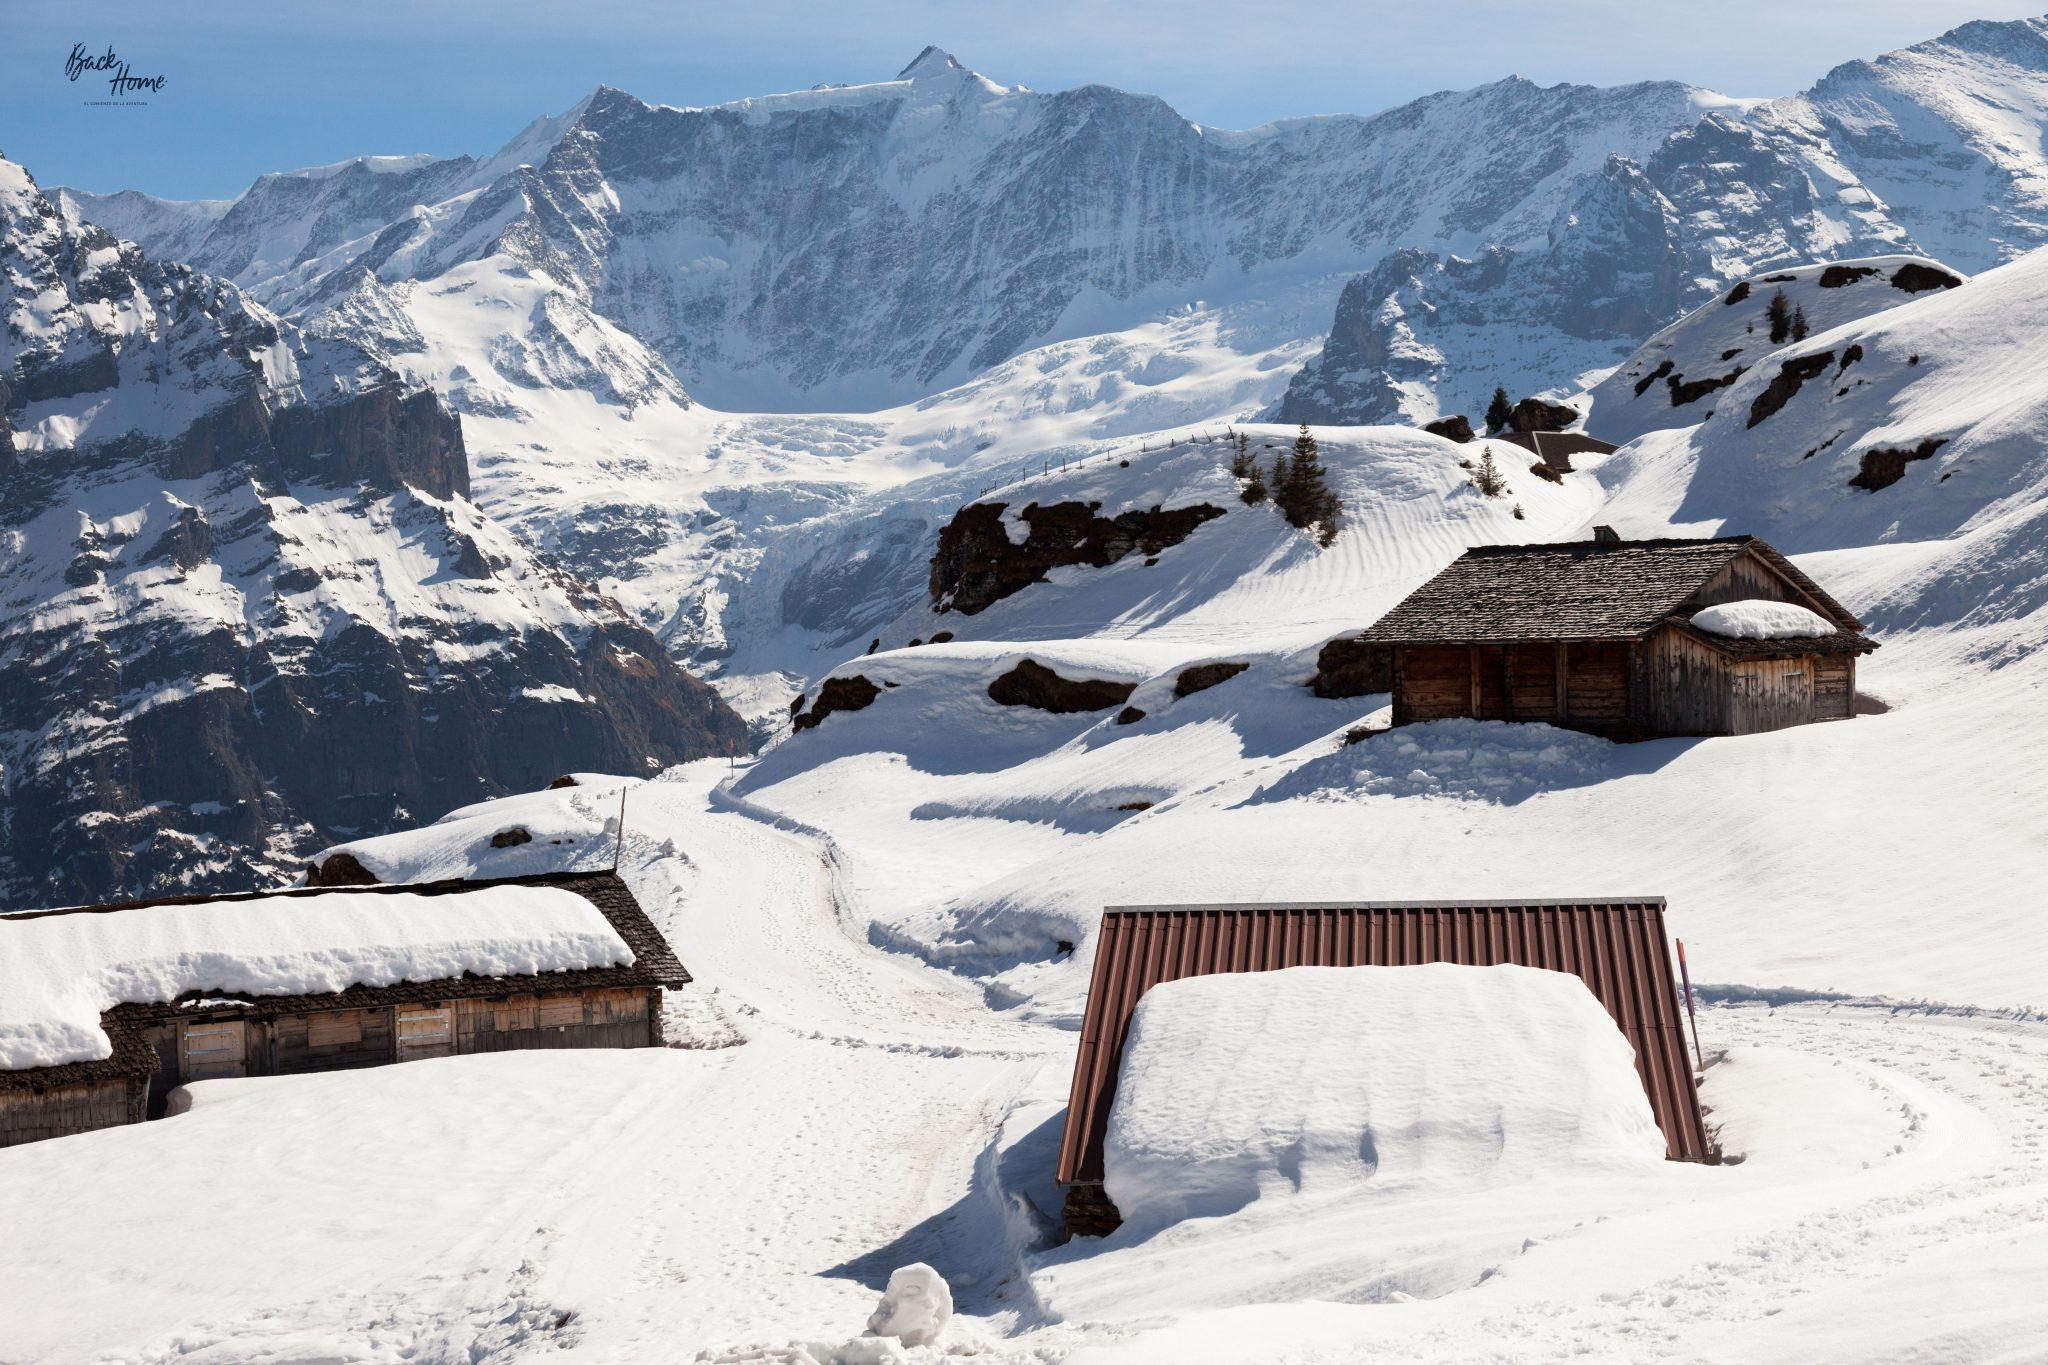 experiencia_workaway_en_suiza_ruta_a_bachalpsee